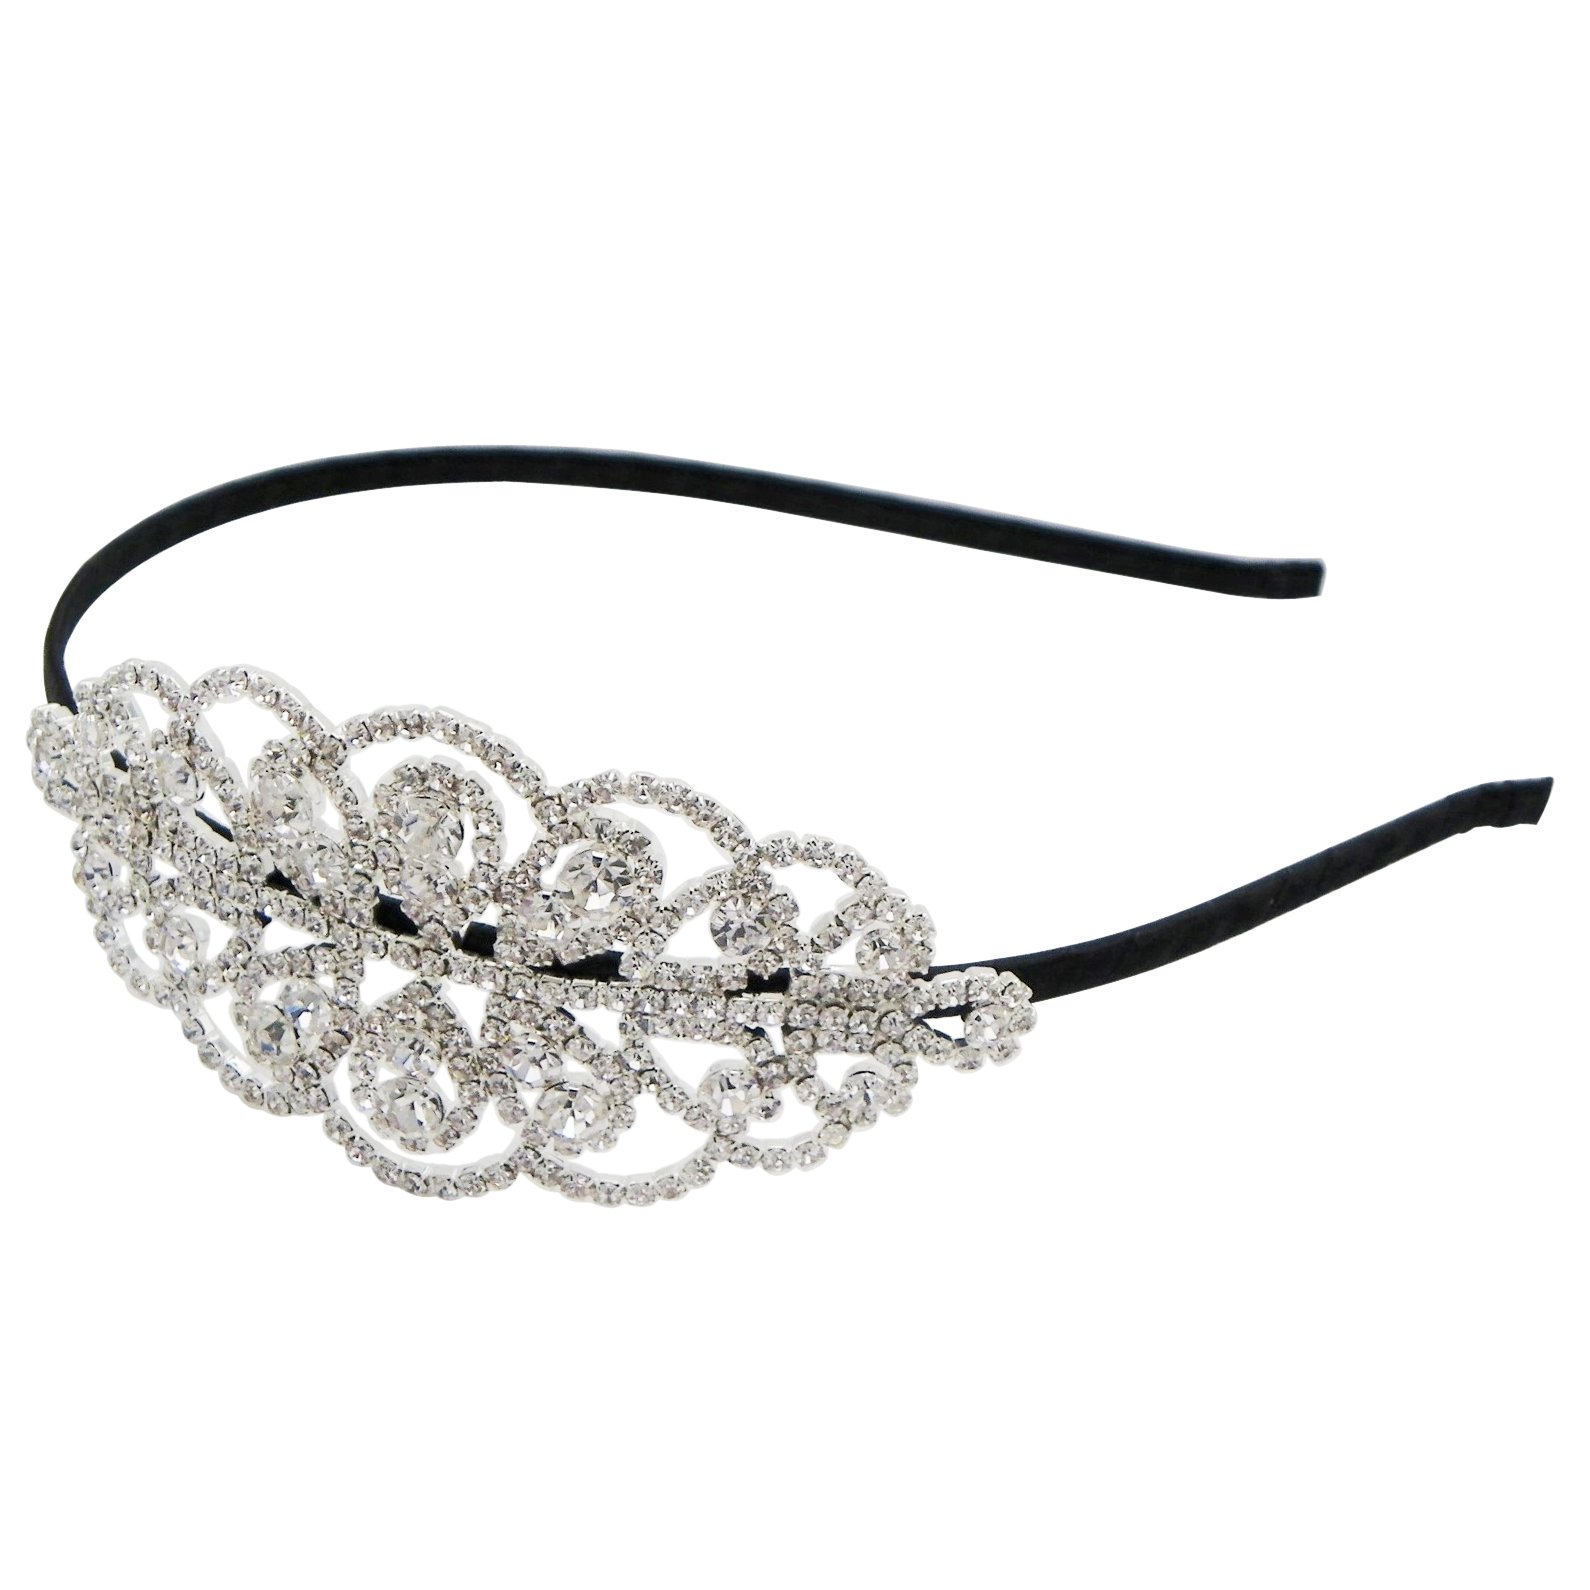 Rosemarie Collections Women's Bridal Crystal Rhinestone Side Spray Headband (Round Stone)